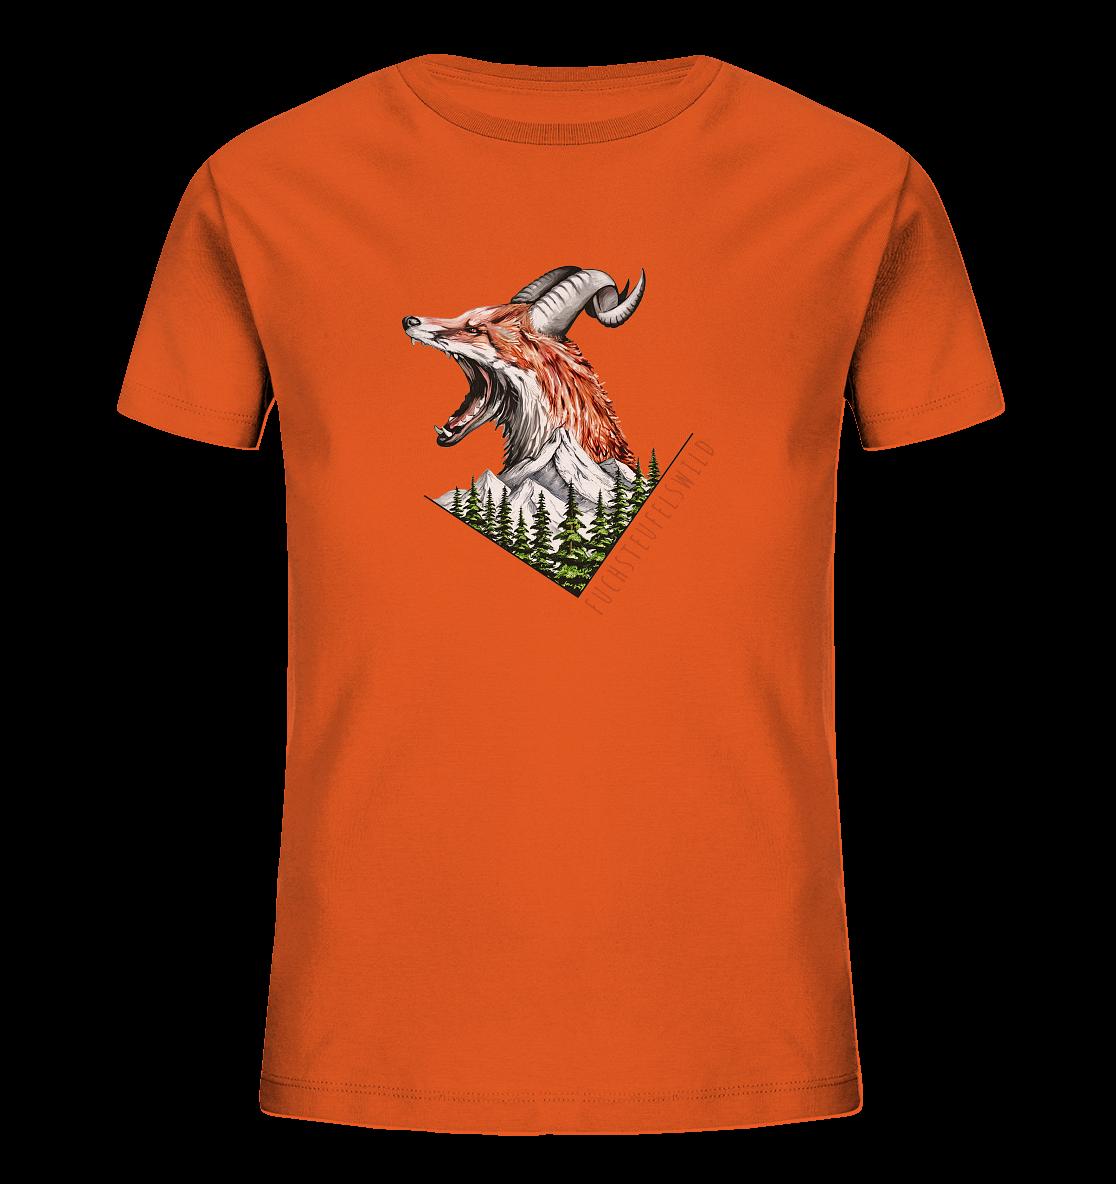 front-kids-organic-shirt-ea5b23-1116x.png